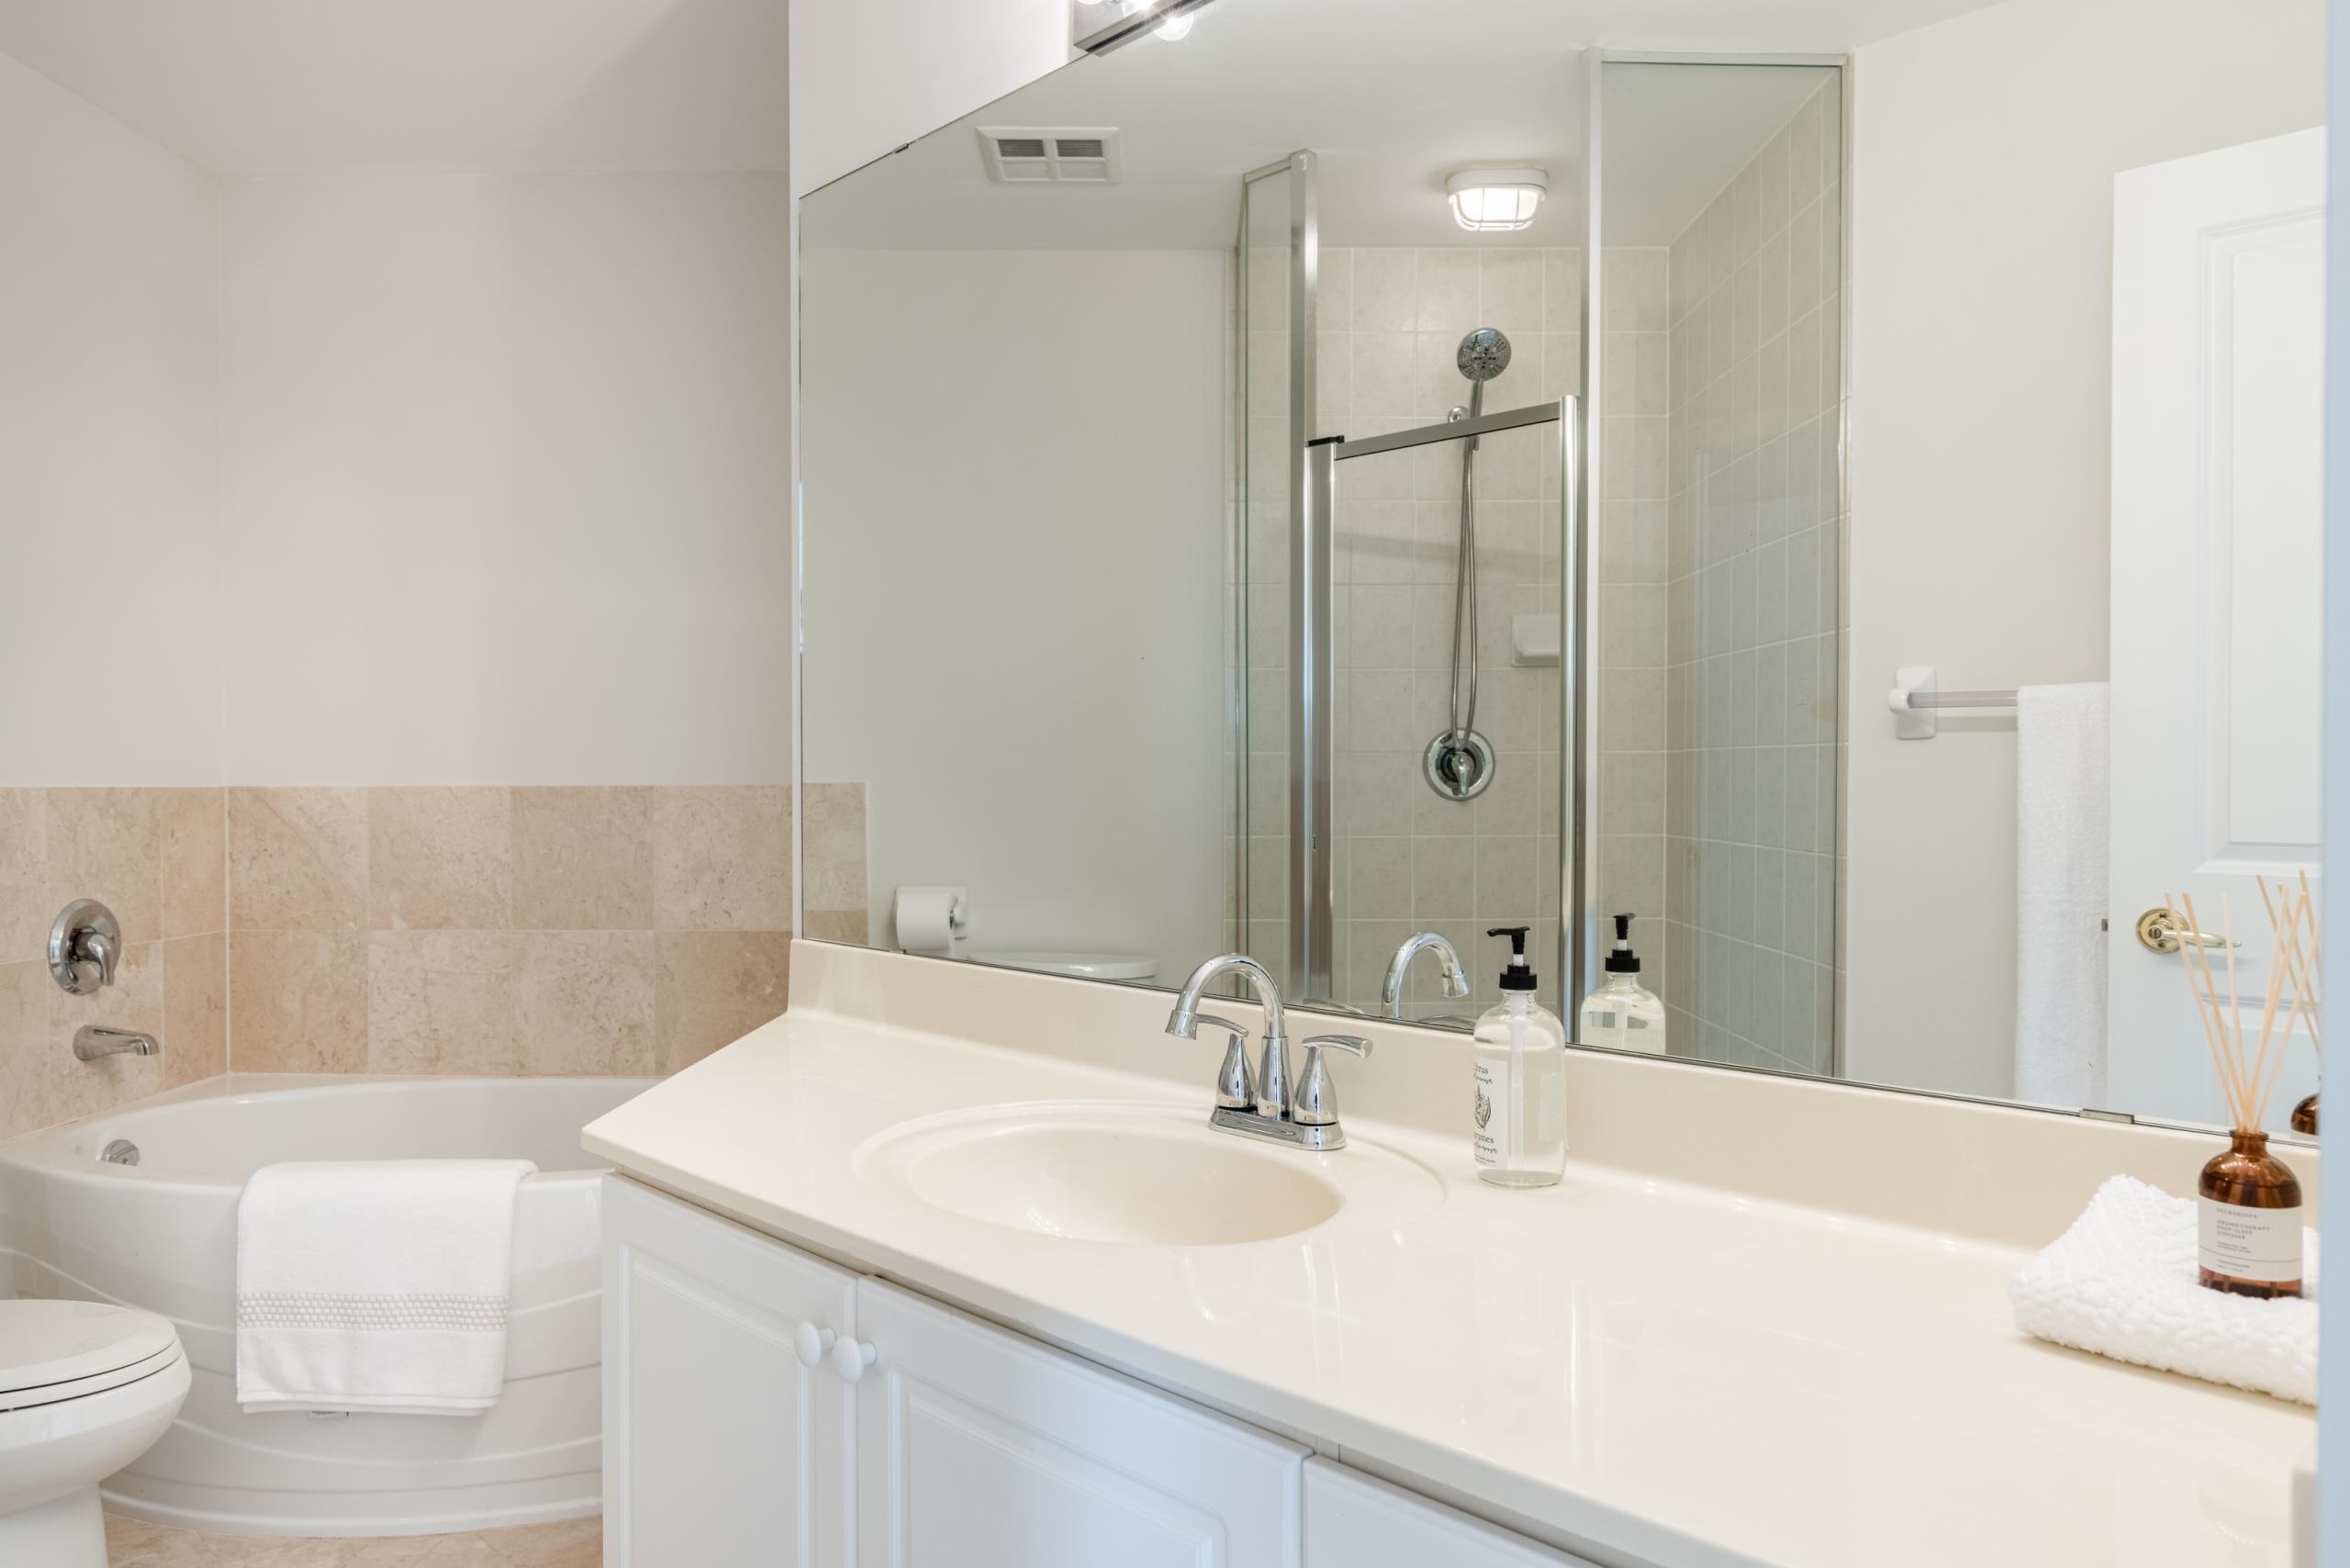 Bathroom featured at 508-40 Old Mill Road, Oakville at Alex Irish & Associates